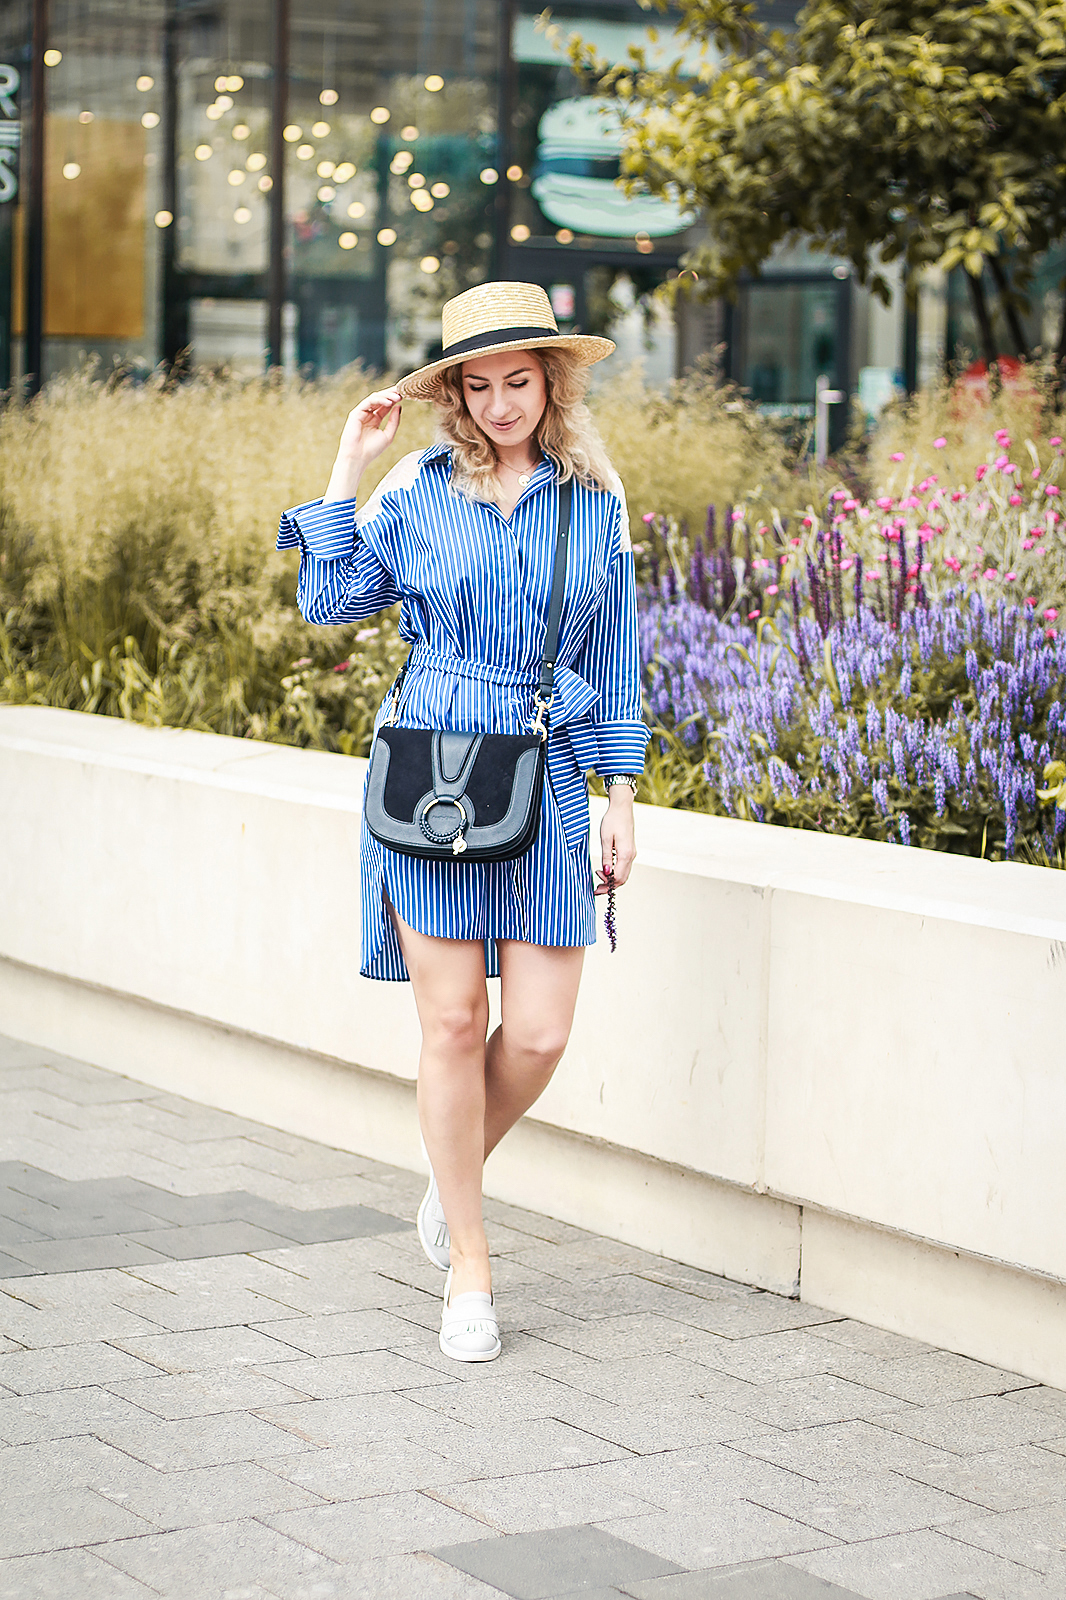 Rita_maslova_zara_blue_striped_shirt_dress_summer_outfit_hat_boater_see_by_chloe_hana